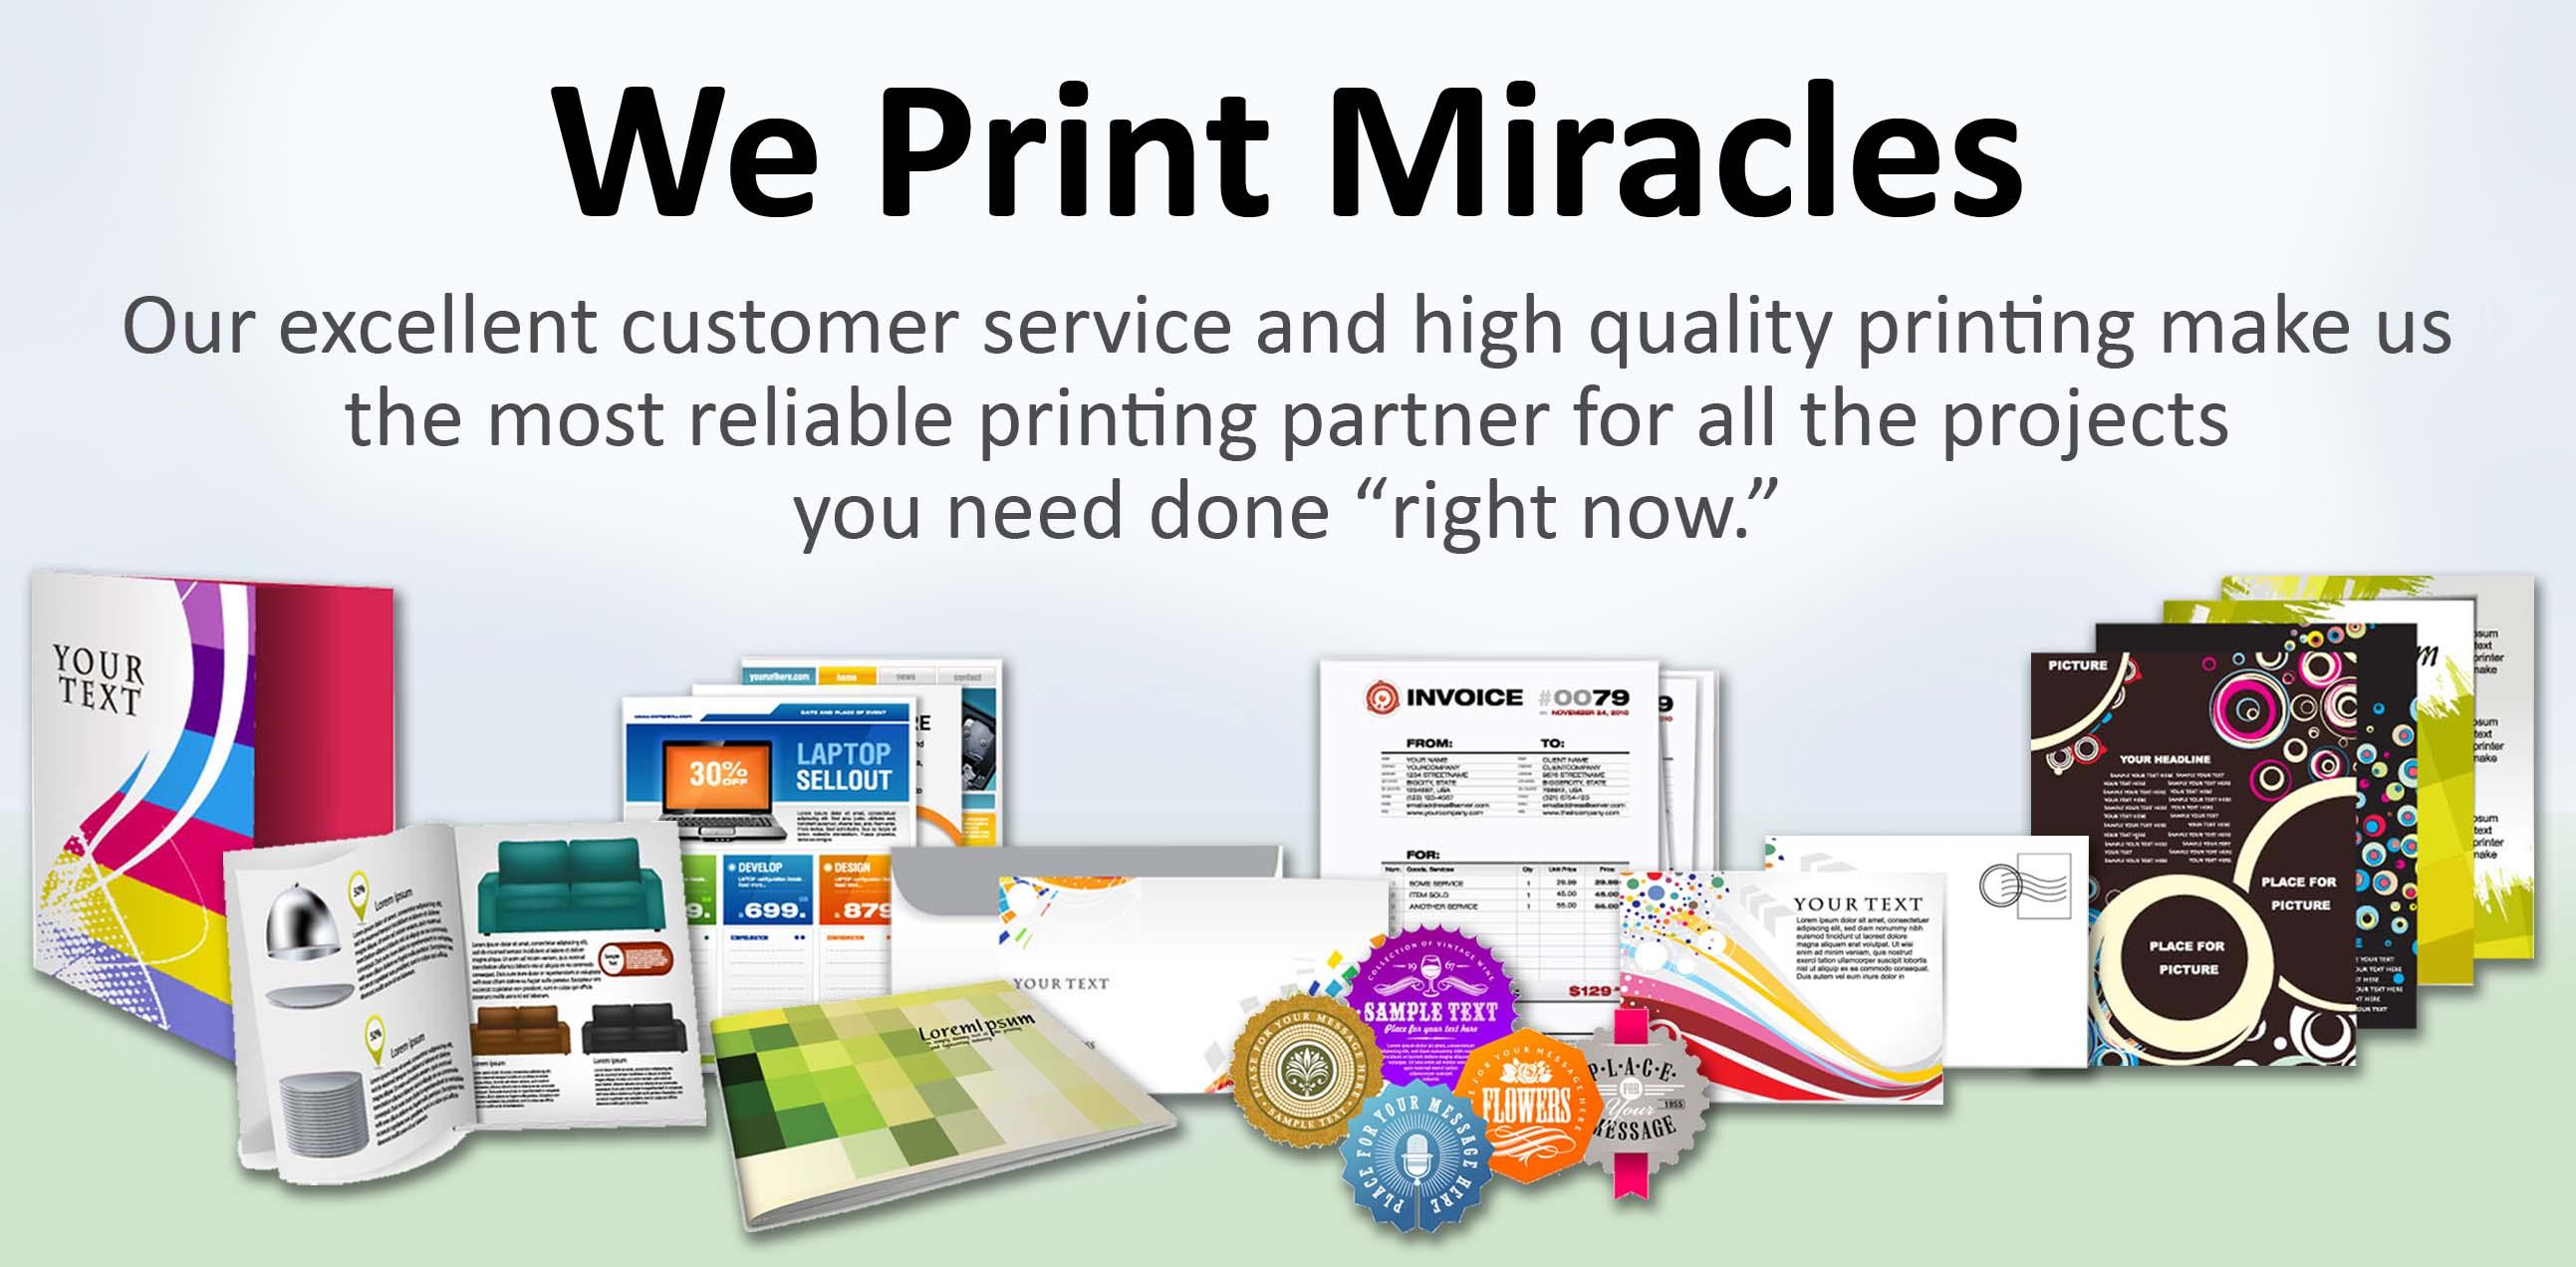 los angeles printing company same day printing slb printing